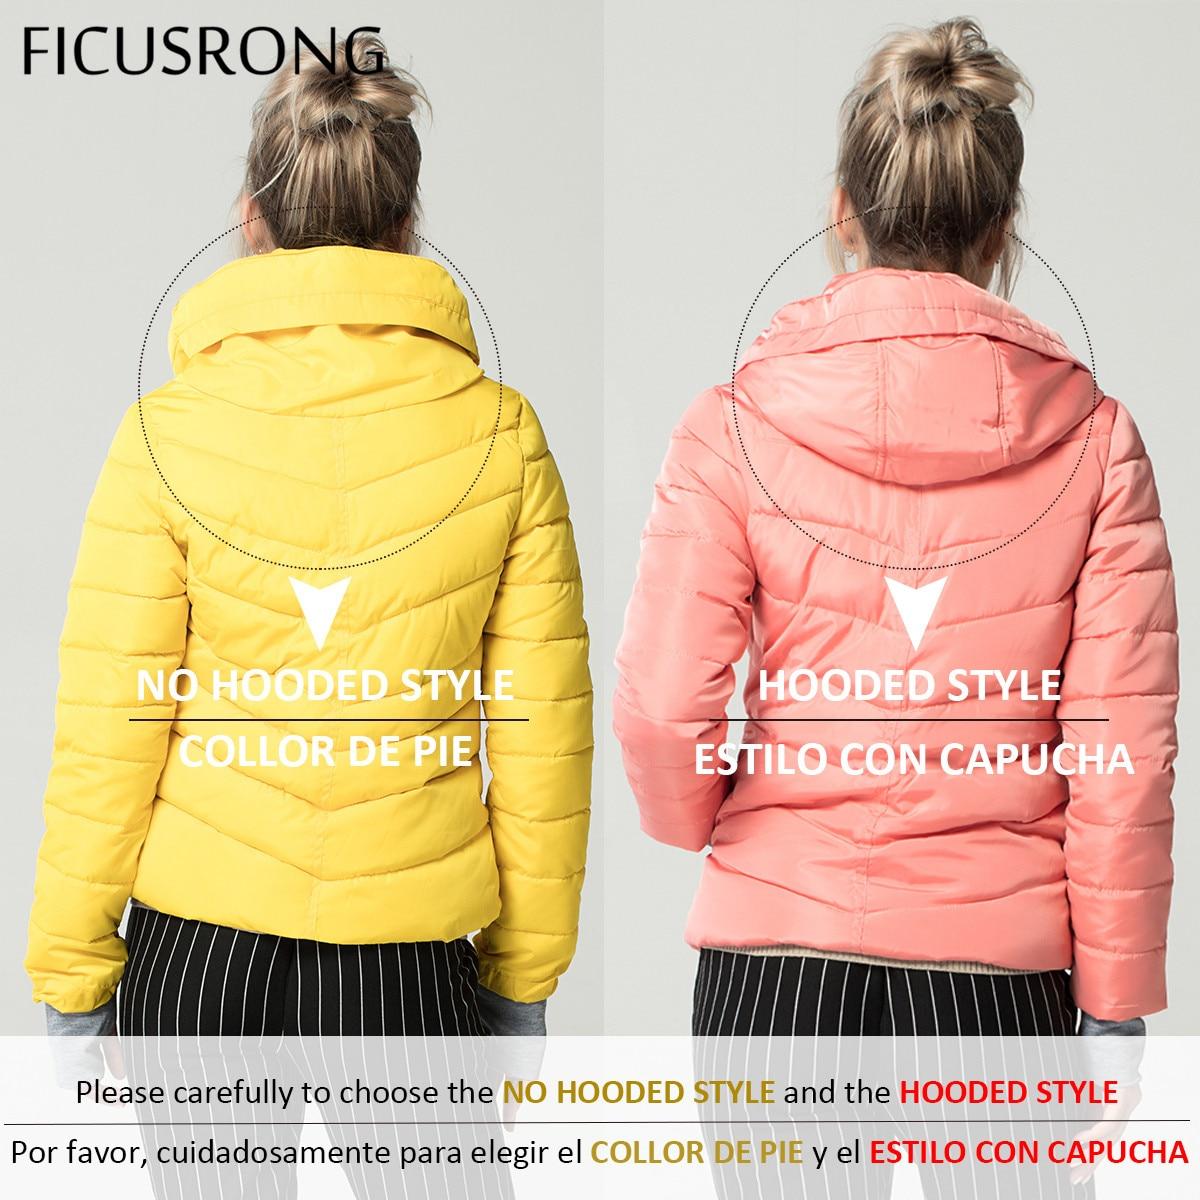 Hooded Yellow Women Autumn Winter Jacket Stand Collar Cotton Padded Female Basic Jacket Outerwear Coat chaqueta